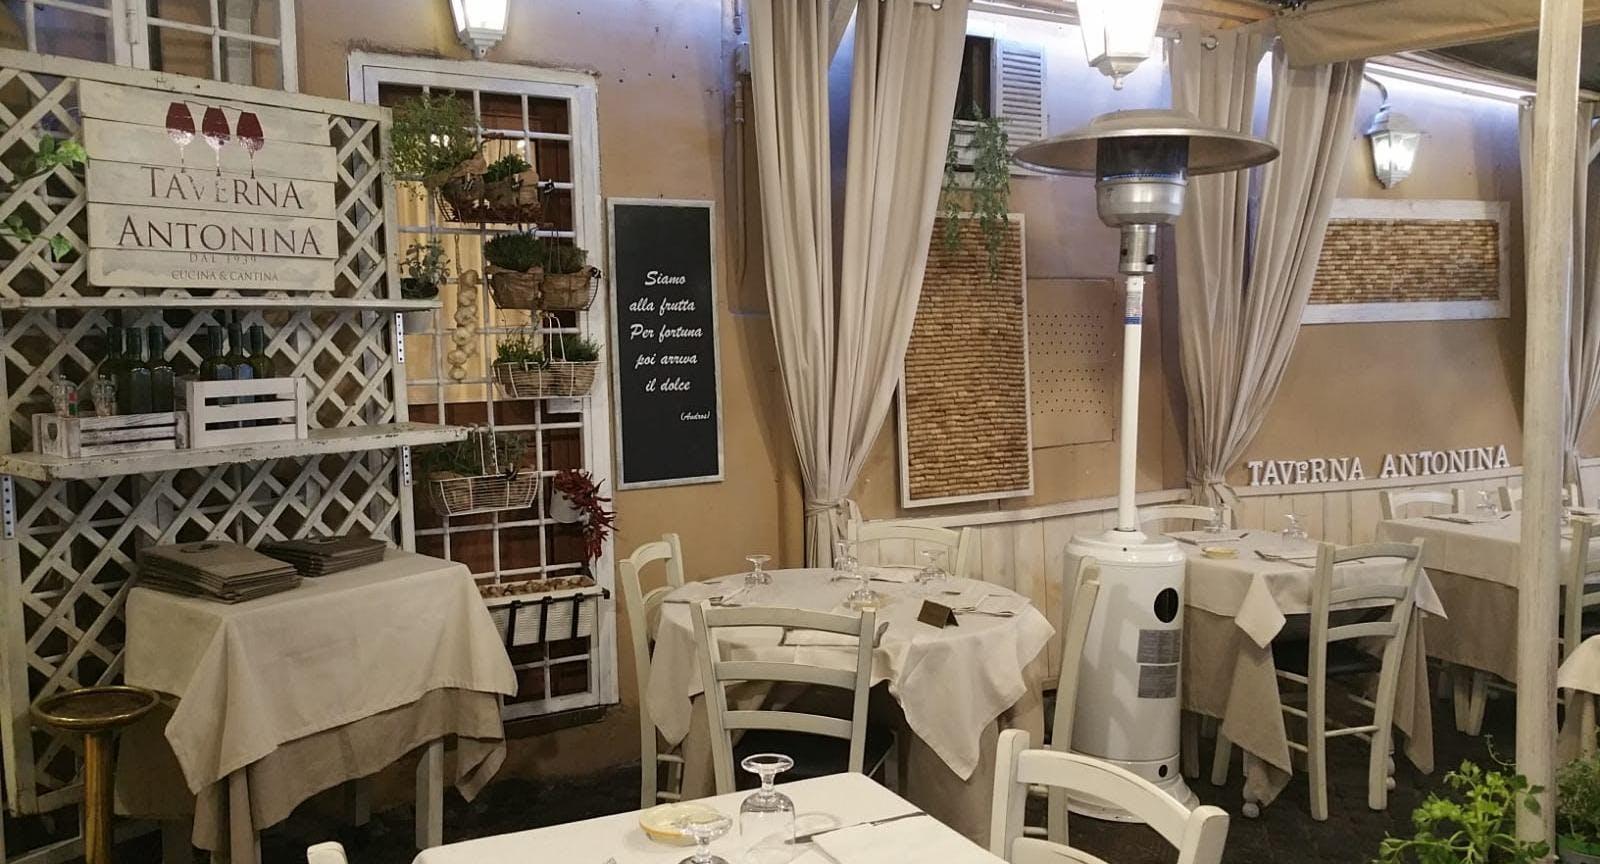 Taverna Antonina dal 1939